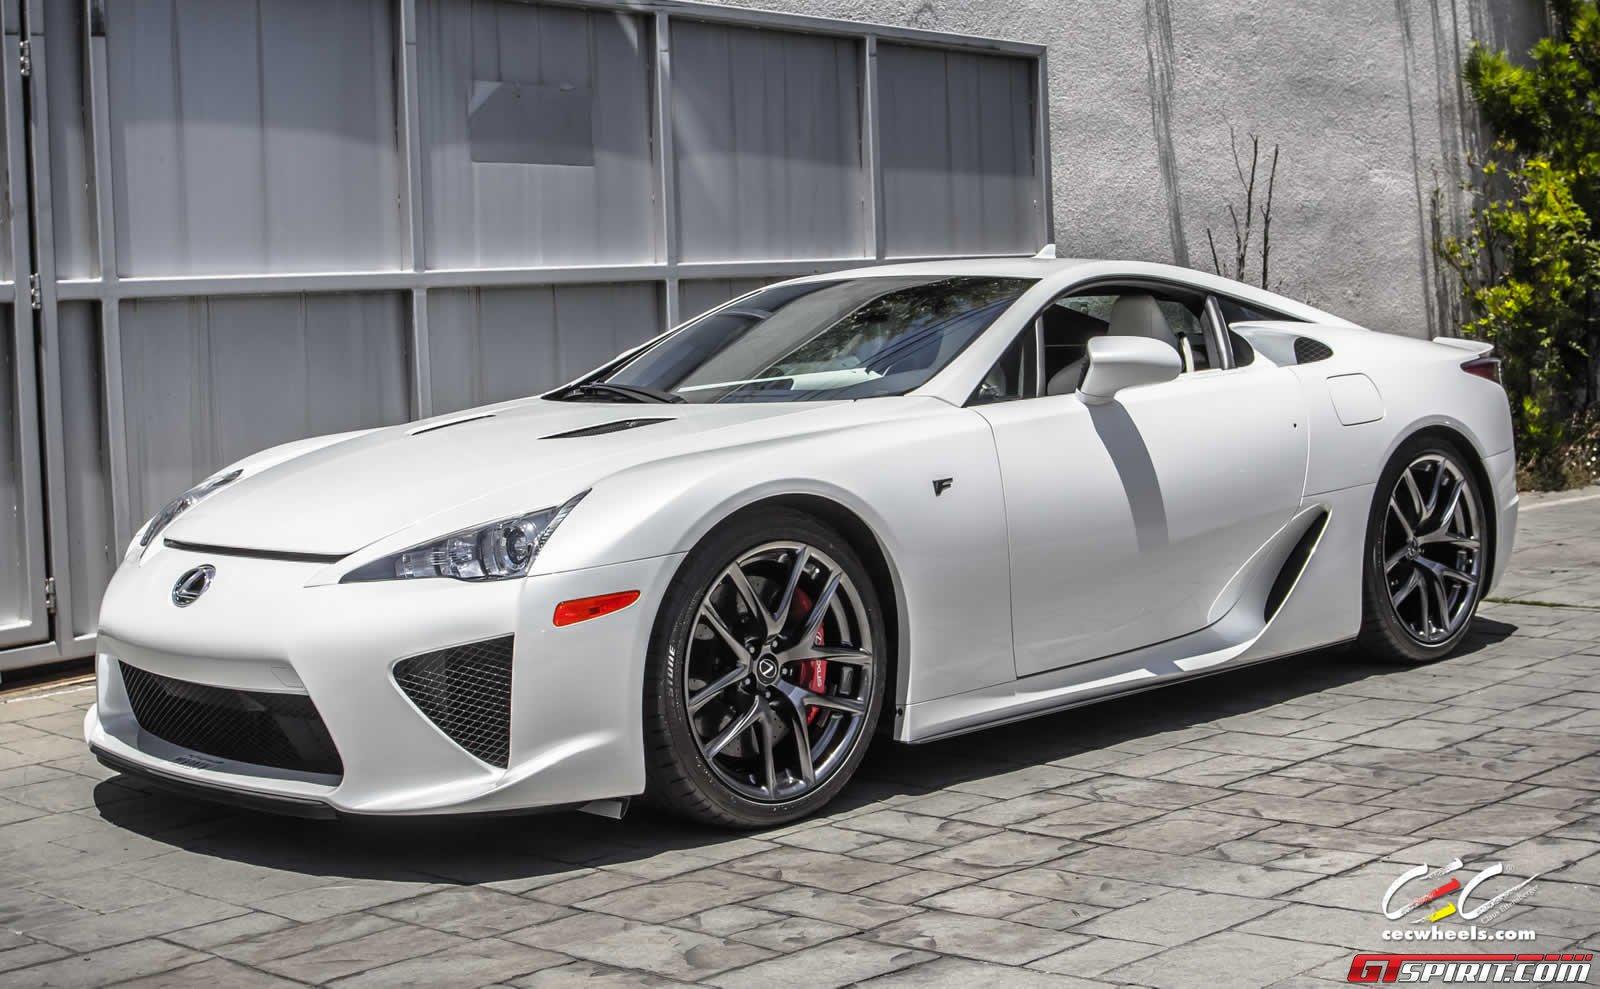 Infiniti Q50 For Sale >> White Lexus LFA Goes for Sale - autoevolution